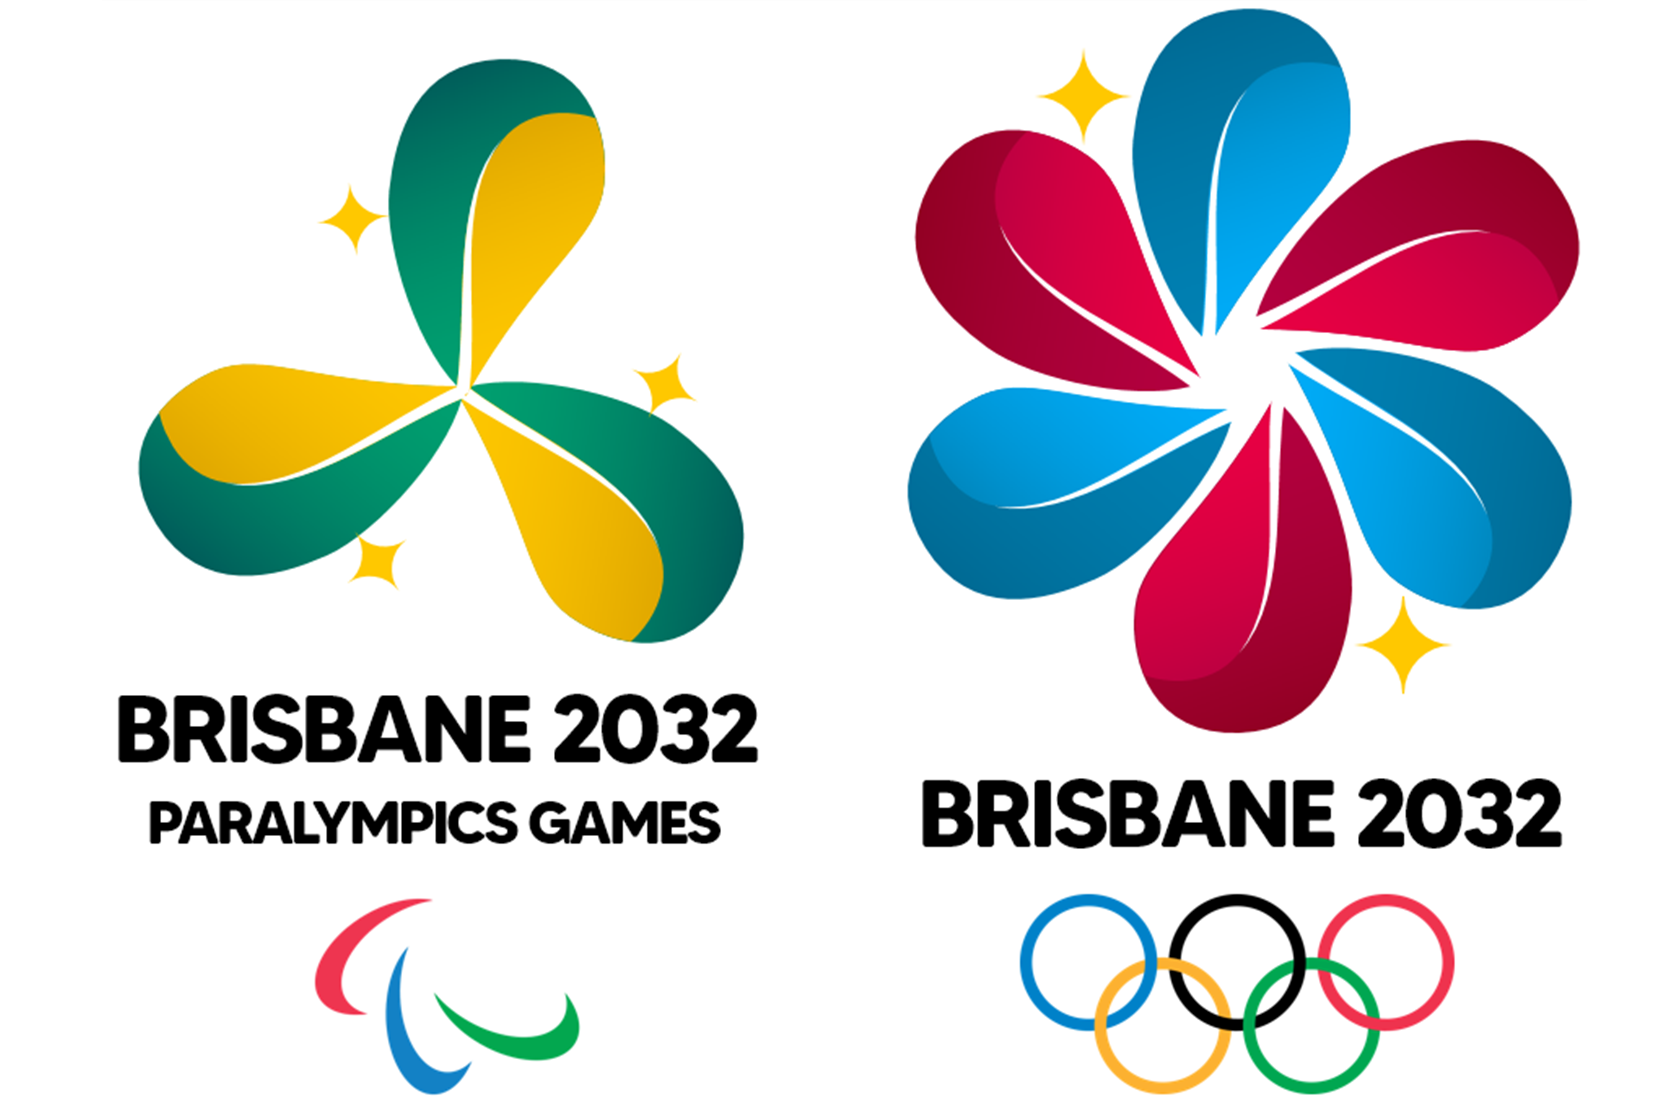 How many jobs will the Brisbane Olympics create?